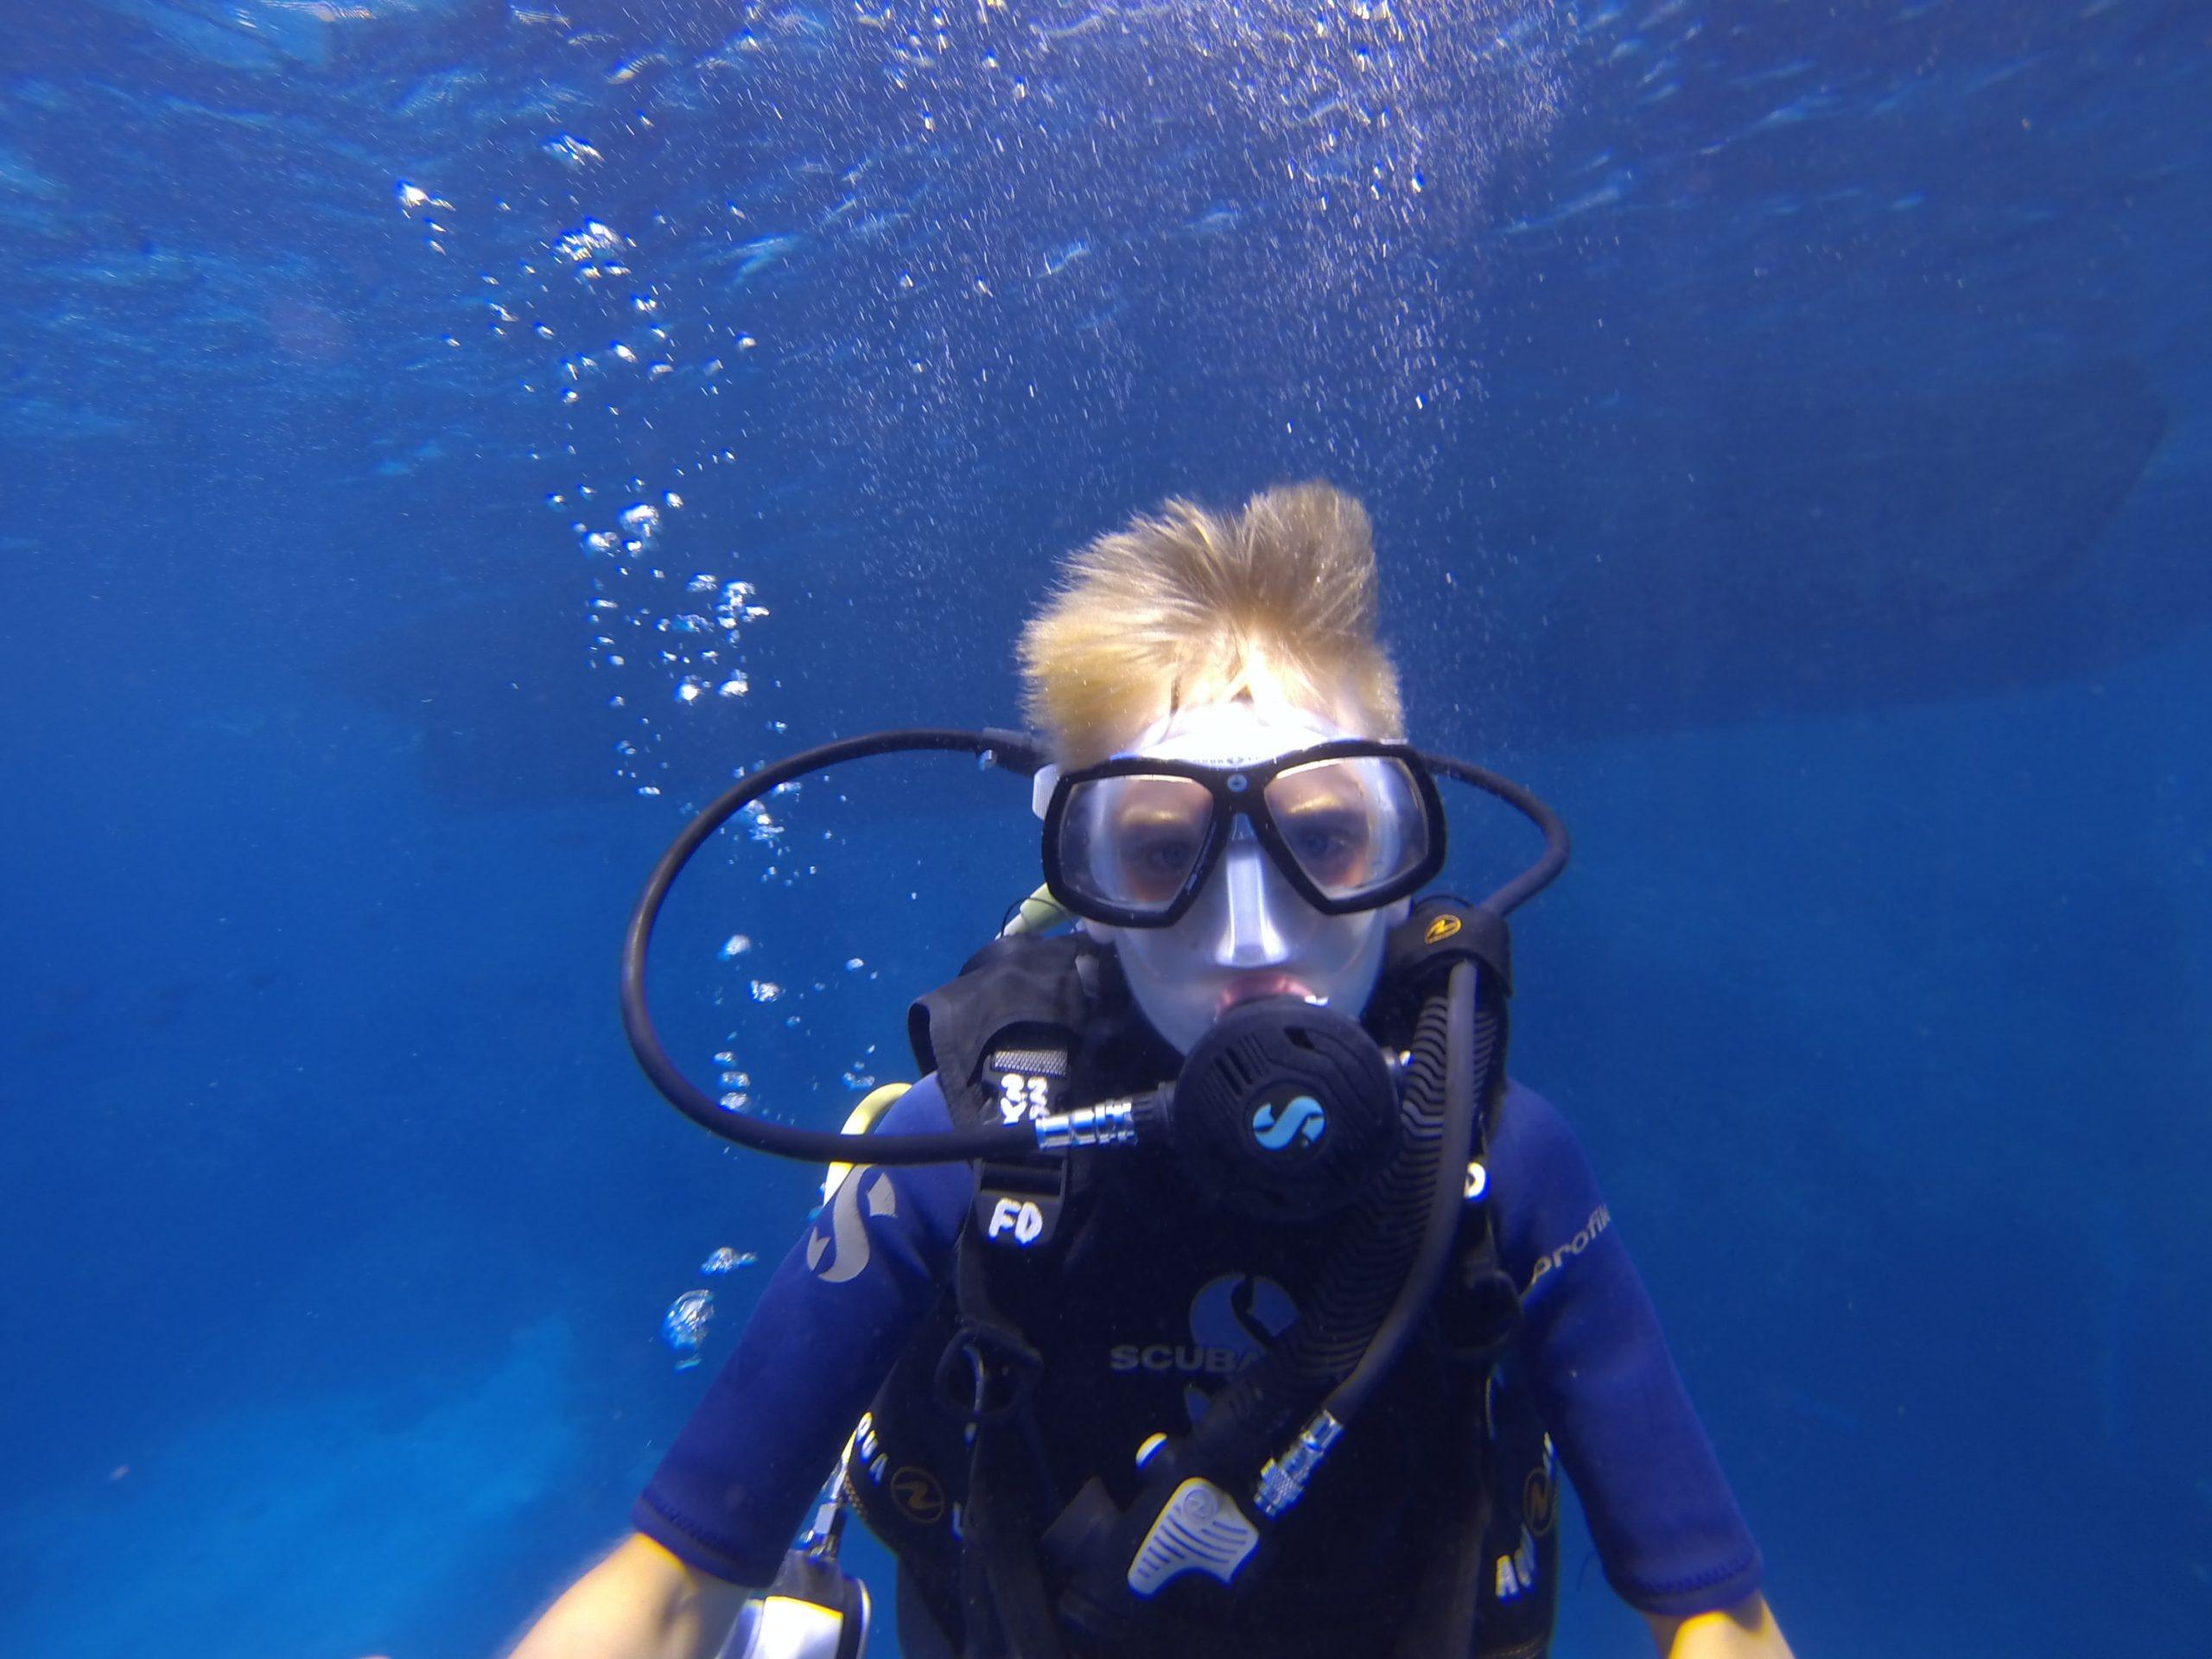 Seagate-Hurghada-Duiken-Scuba-Diving-Padi-Junior-Duikcursus-Divecourse